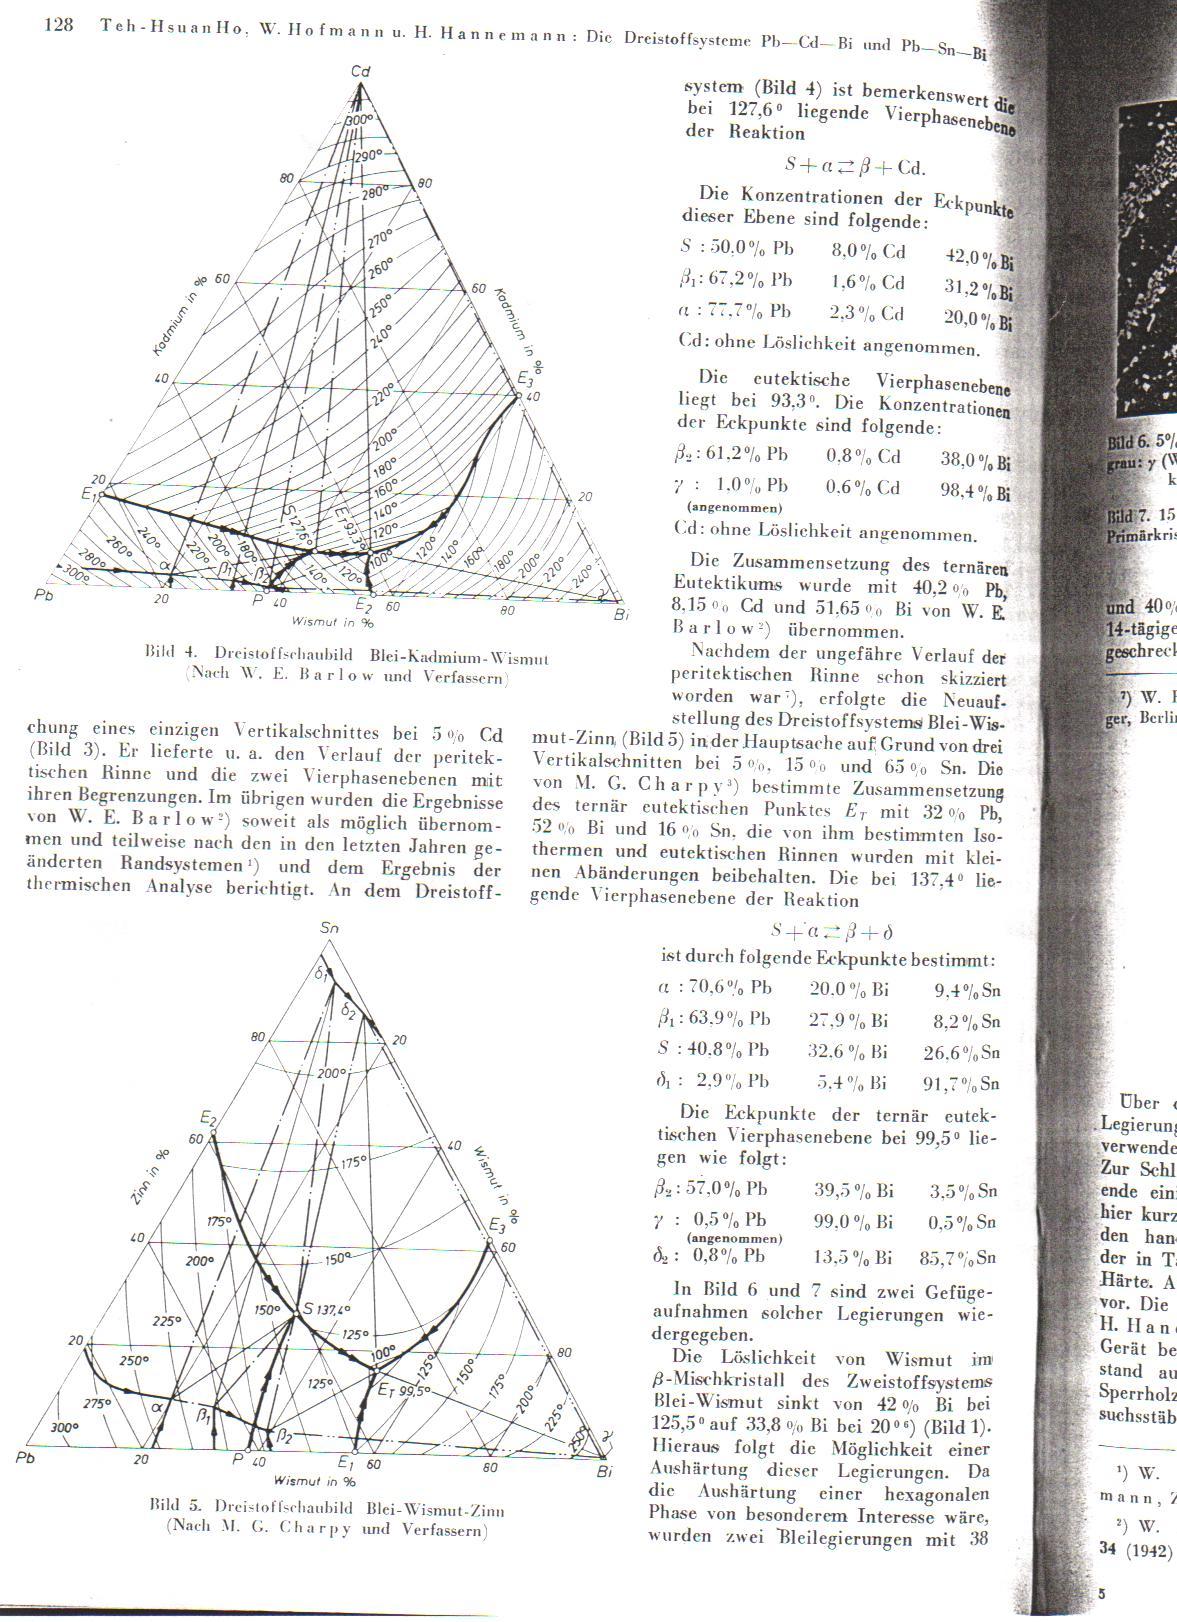 bismuth alloy stuff 2.JPG - 329kB